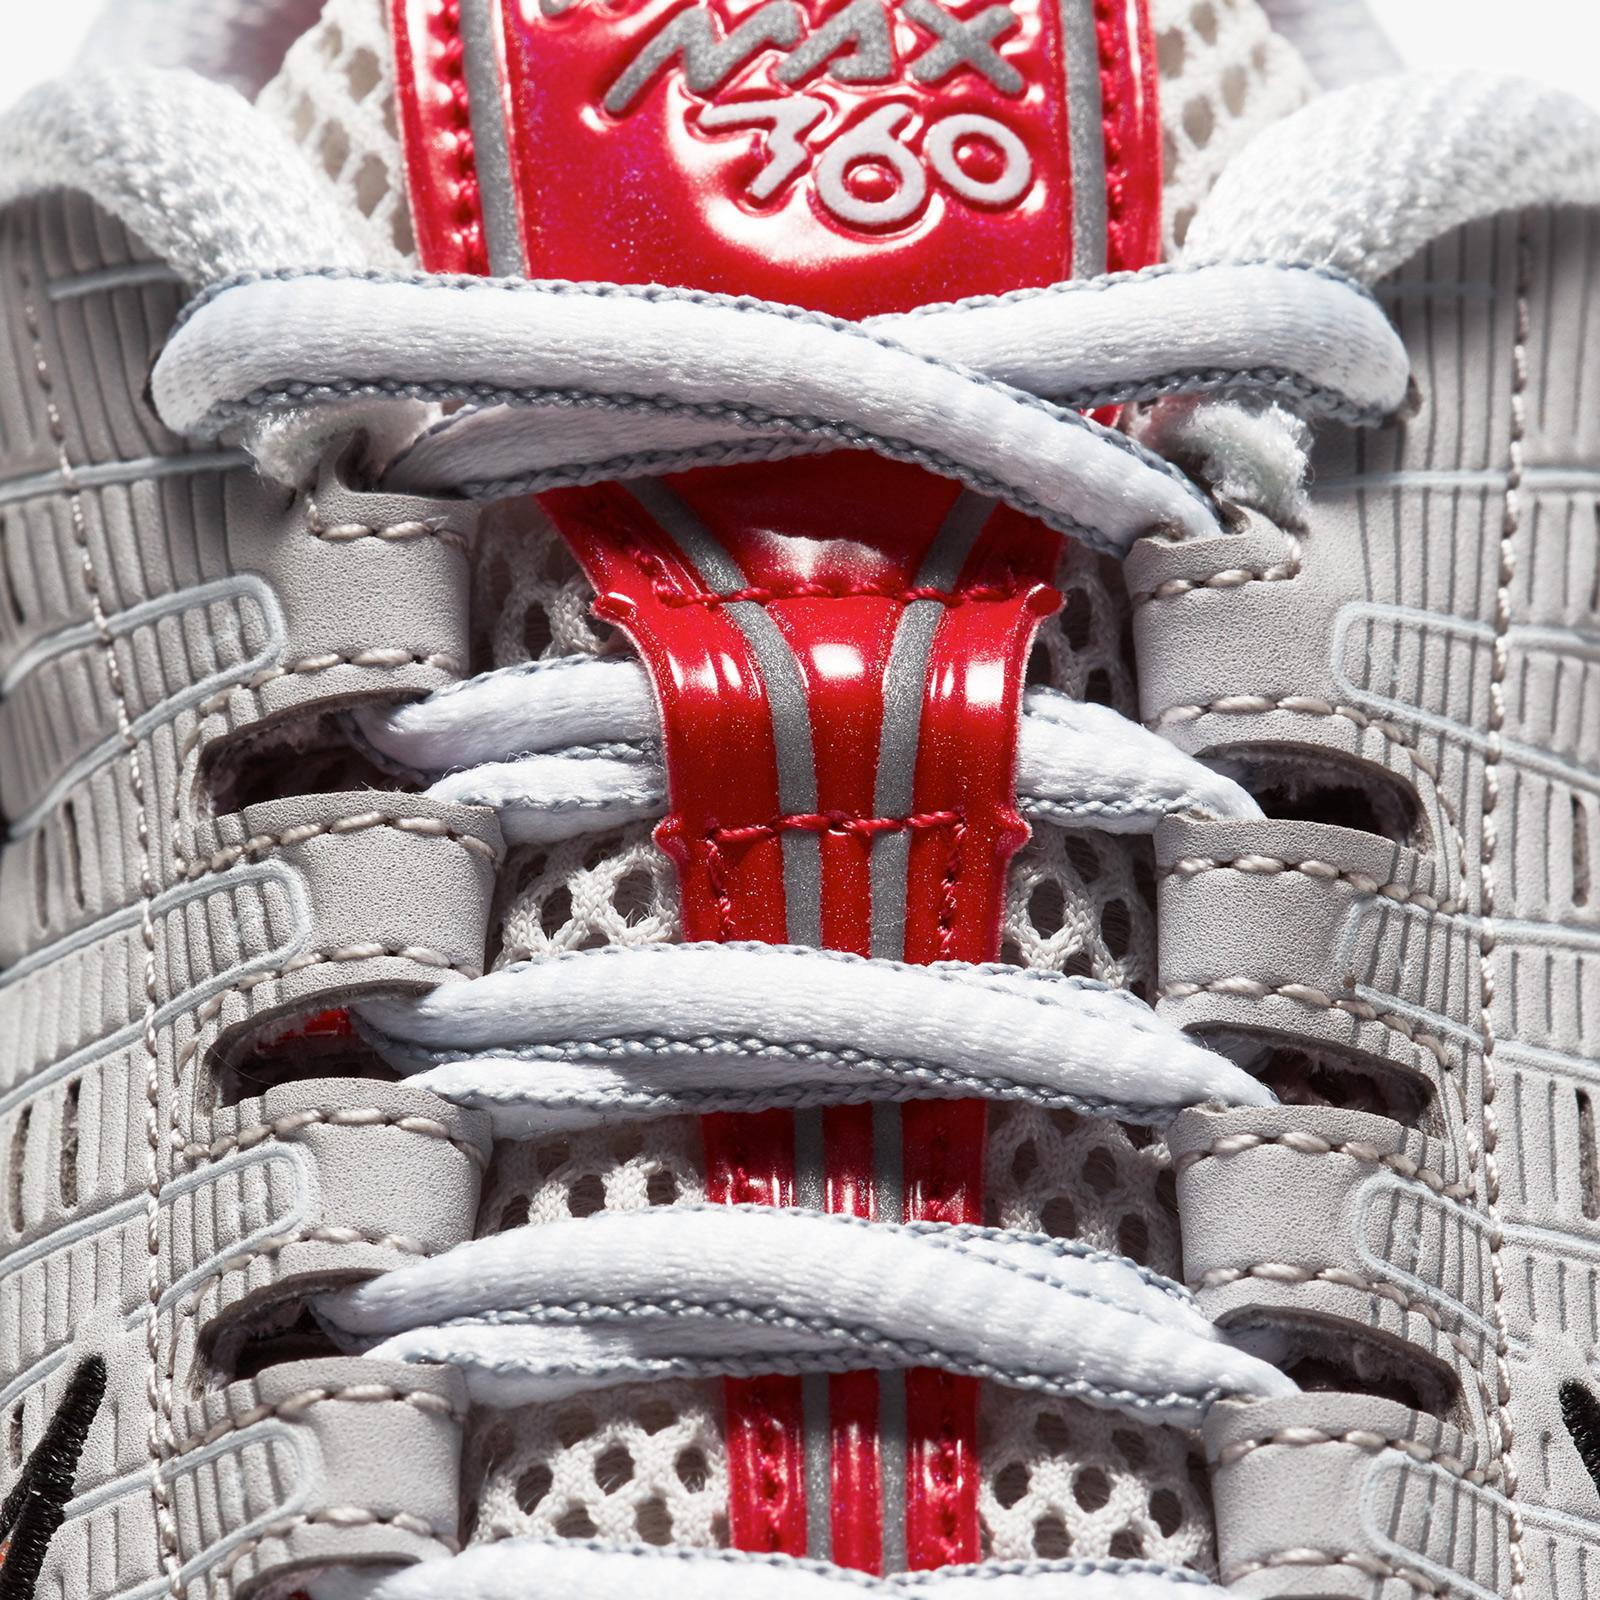 Nike Wmns Air Vapormax 360 Ck2719 001 Sneakersnstuff I